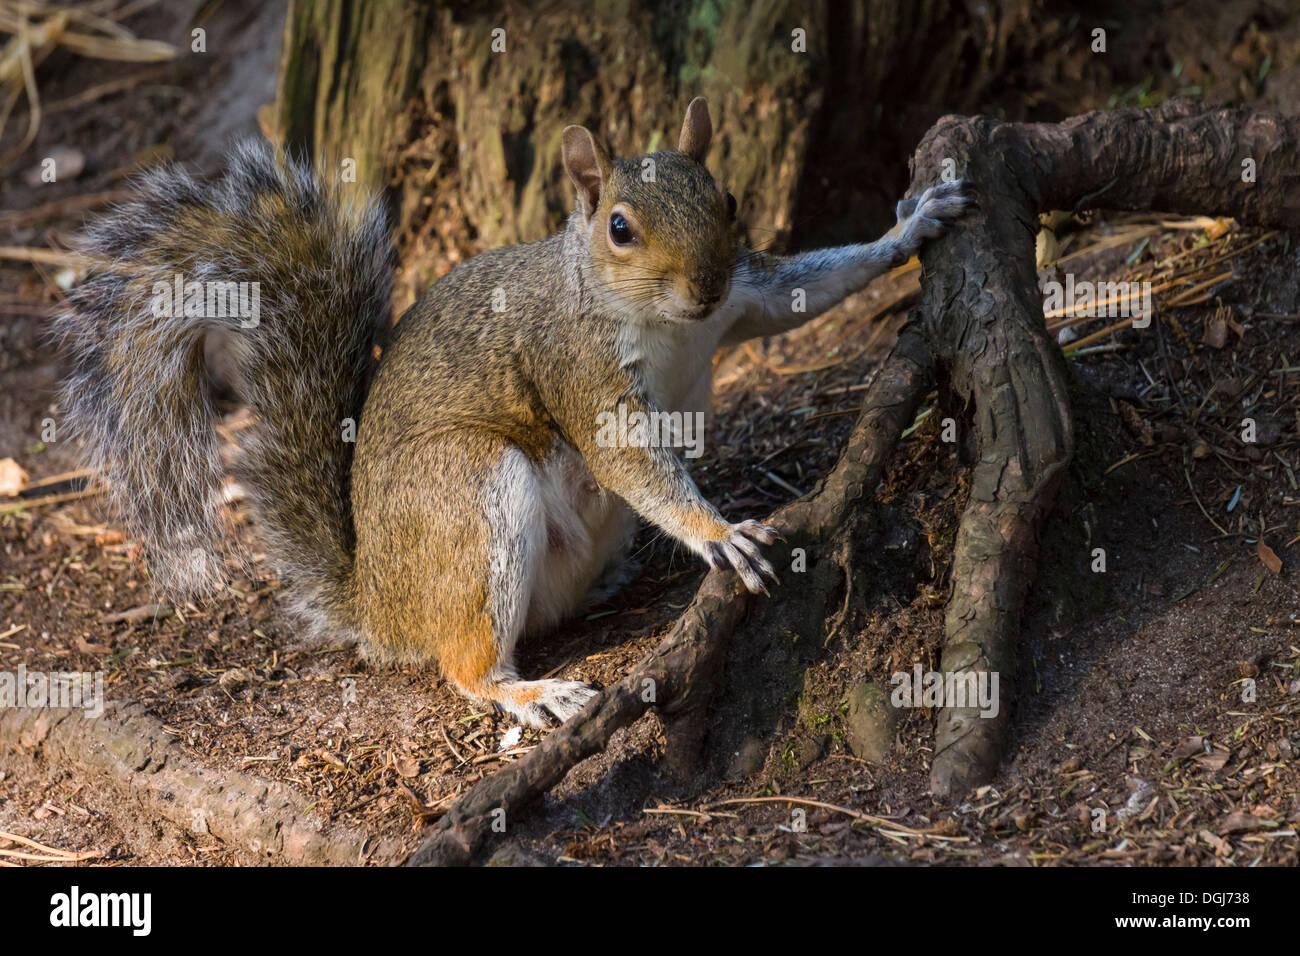 Grey Squirrel - Sciurus carolinensis, in the process of burying food amonst tree roots. - Stock Image